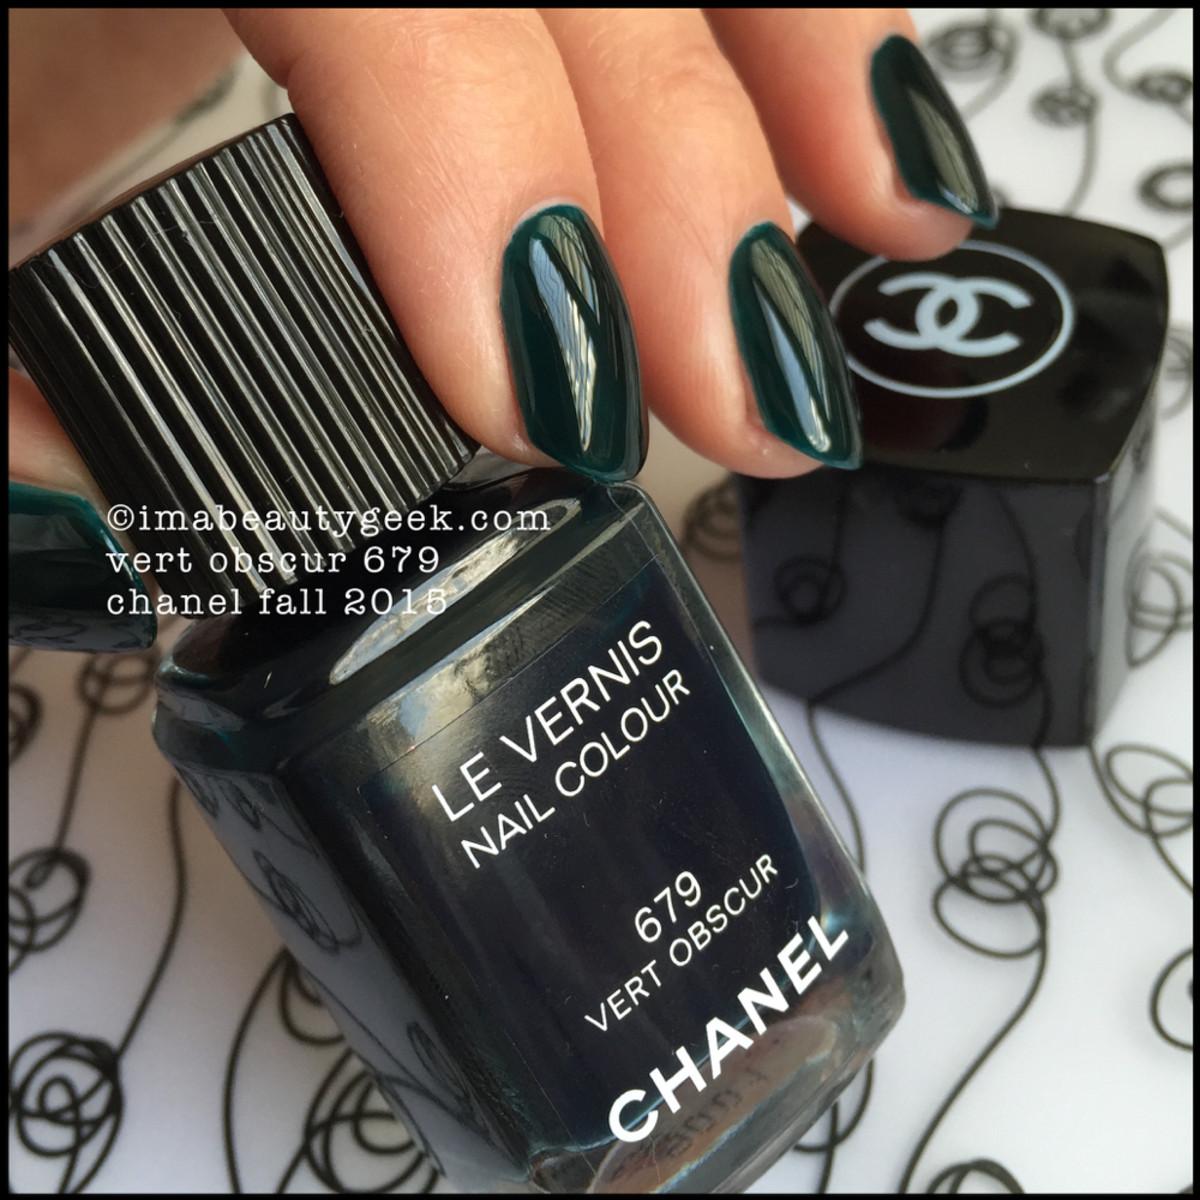 Chanel Vert Obscur 679_ Chanel Fall 2015 Beautygeeks